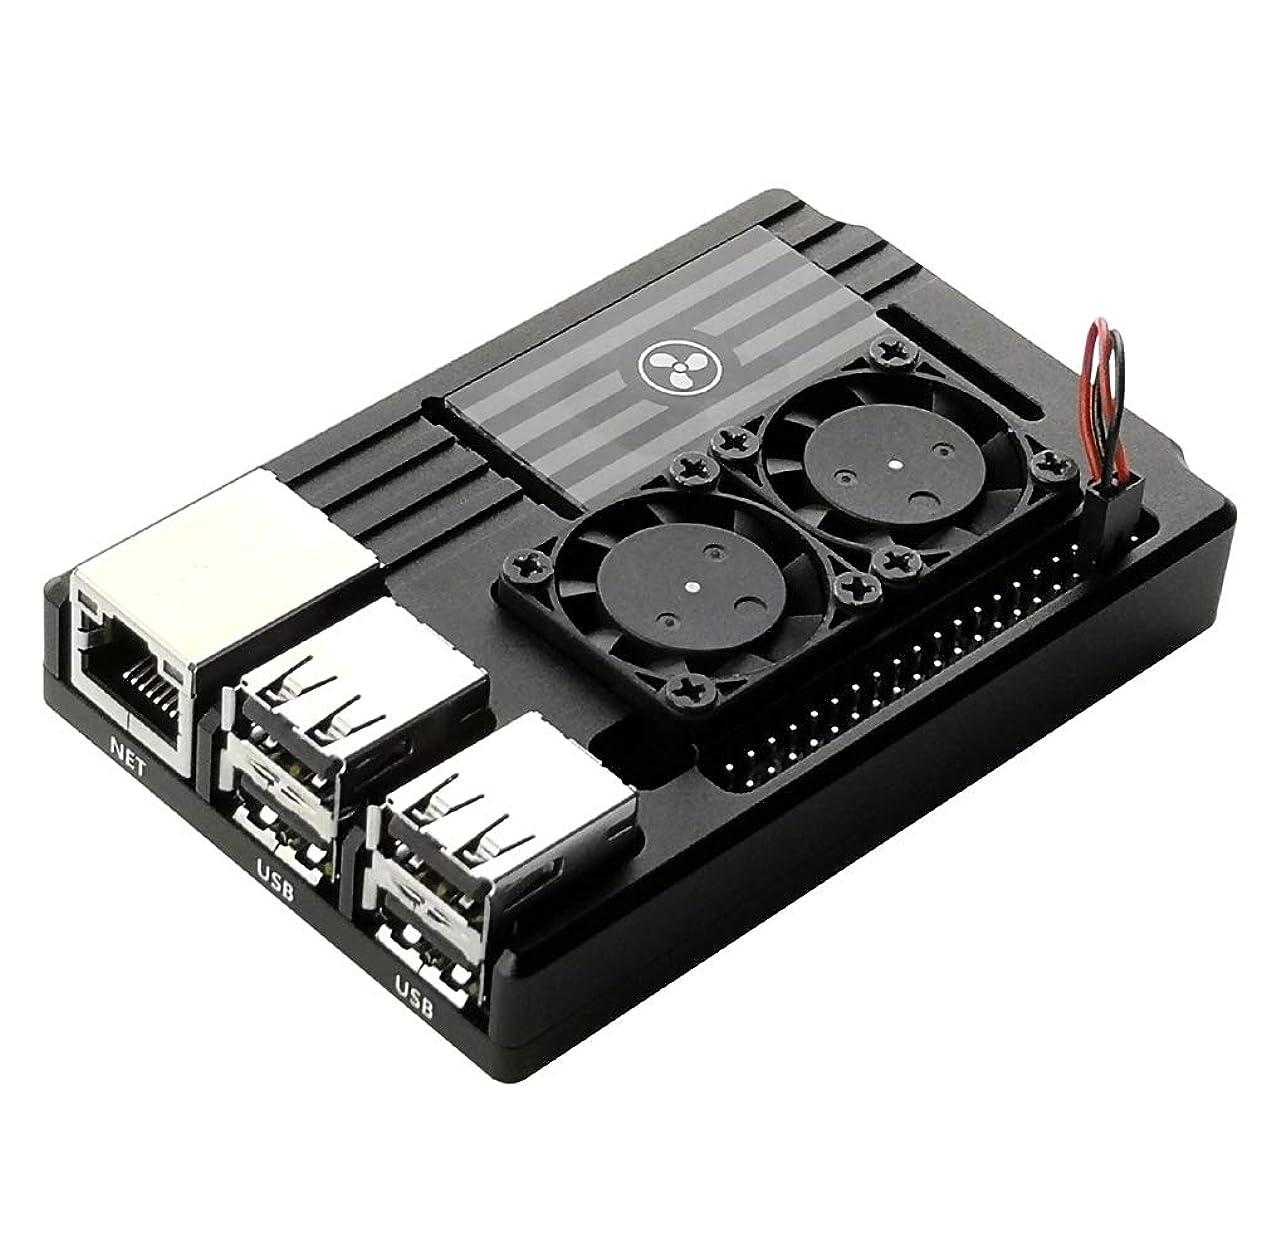 EleDuino Raspberry Pi 3 B+ Aluminum Case Enclosure with Dual Active Cooling Fan Black (Aluminum Case) xgqzduyleftpu675